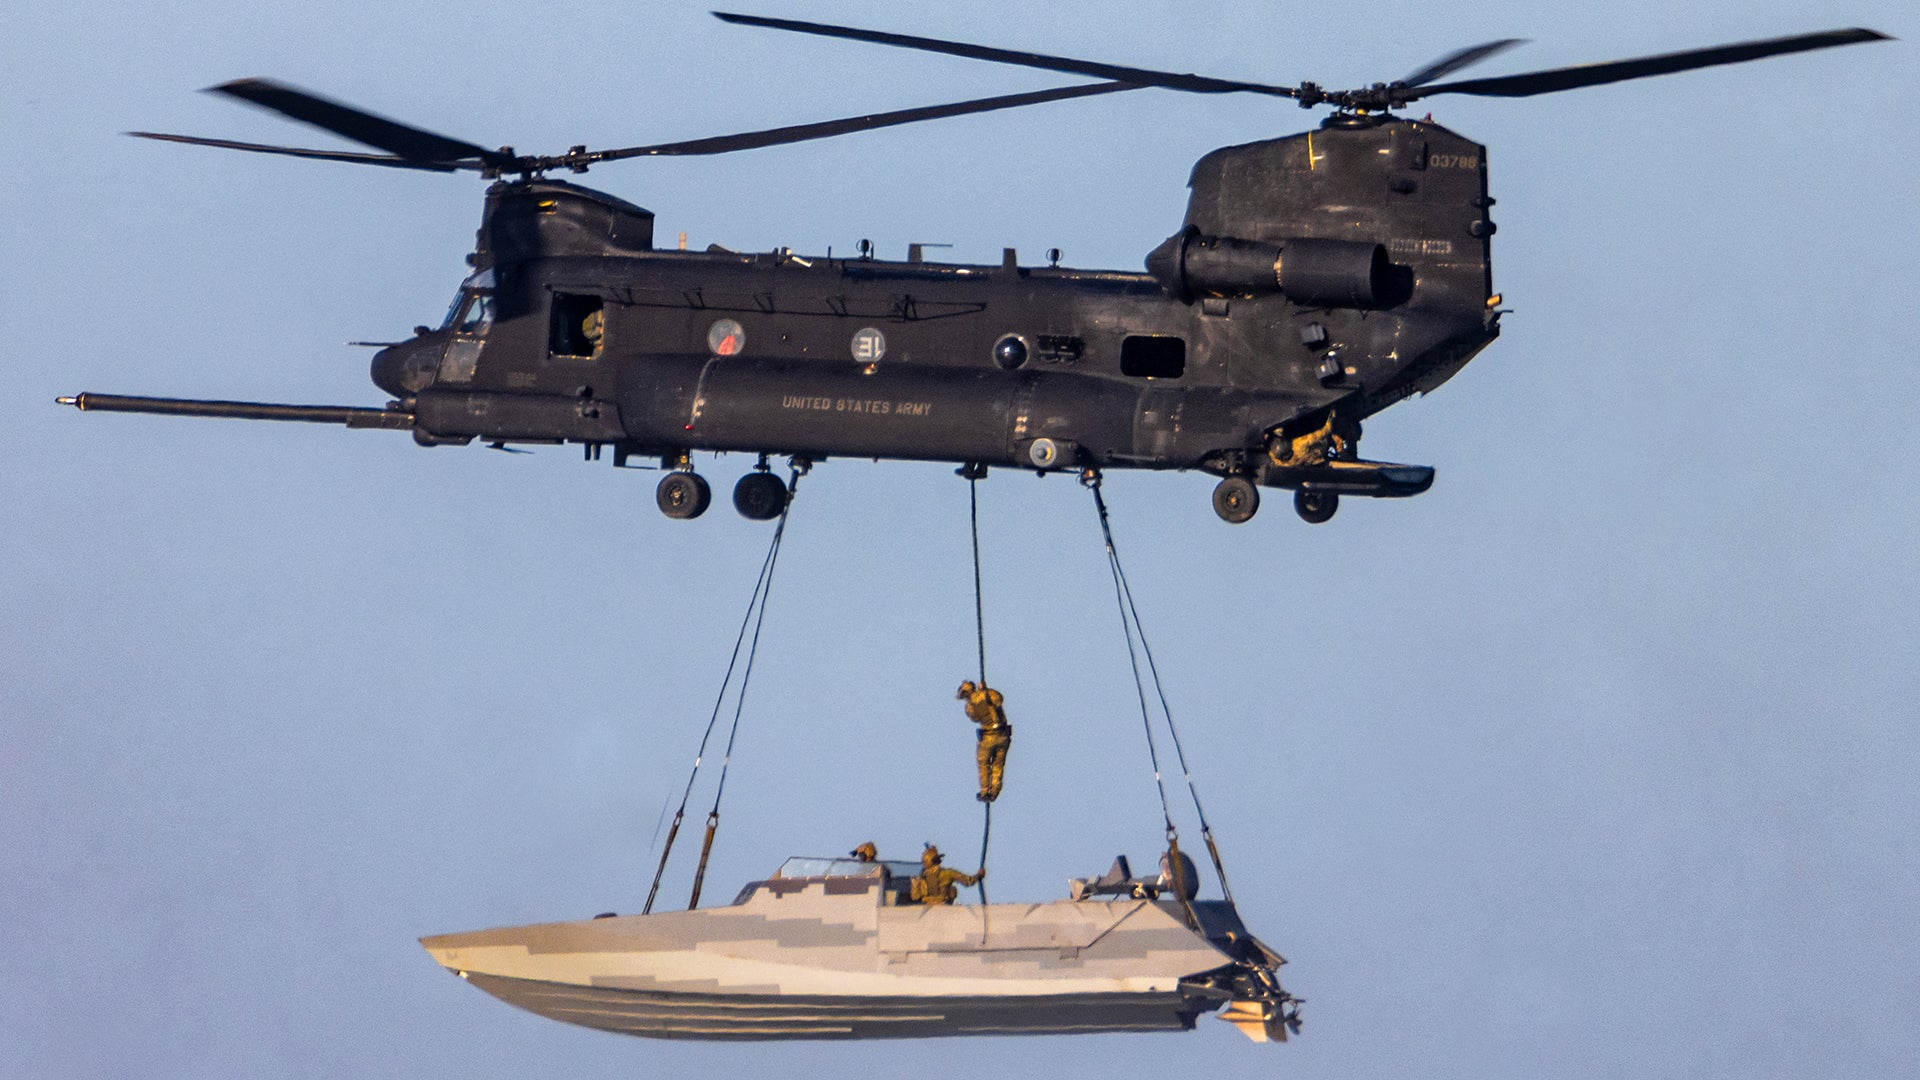 160th-fast-rope-boat.jpg